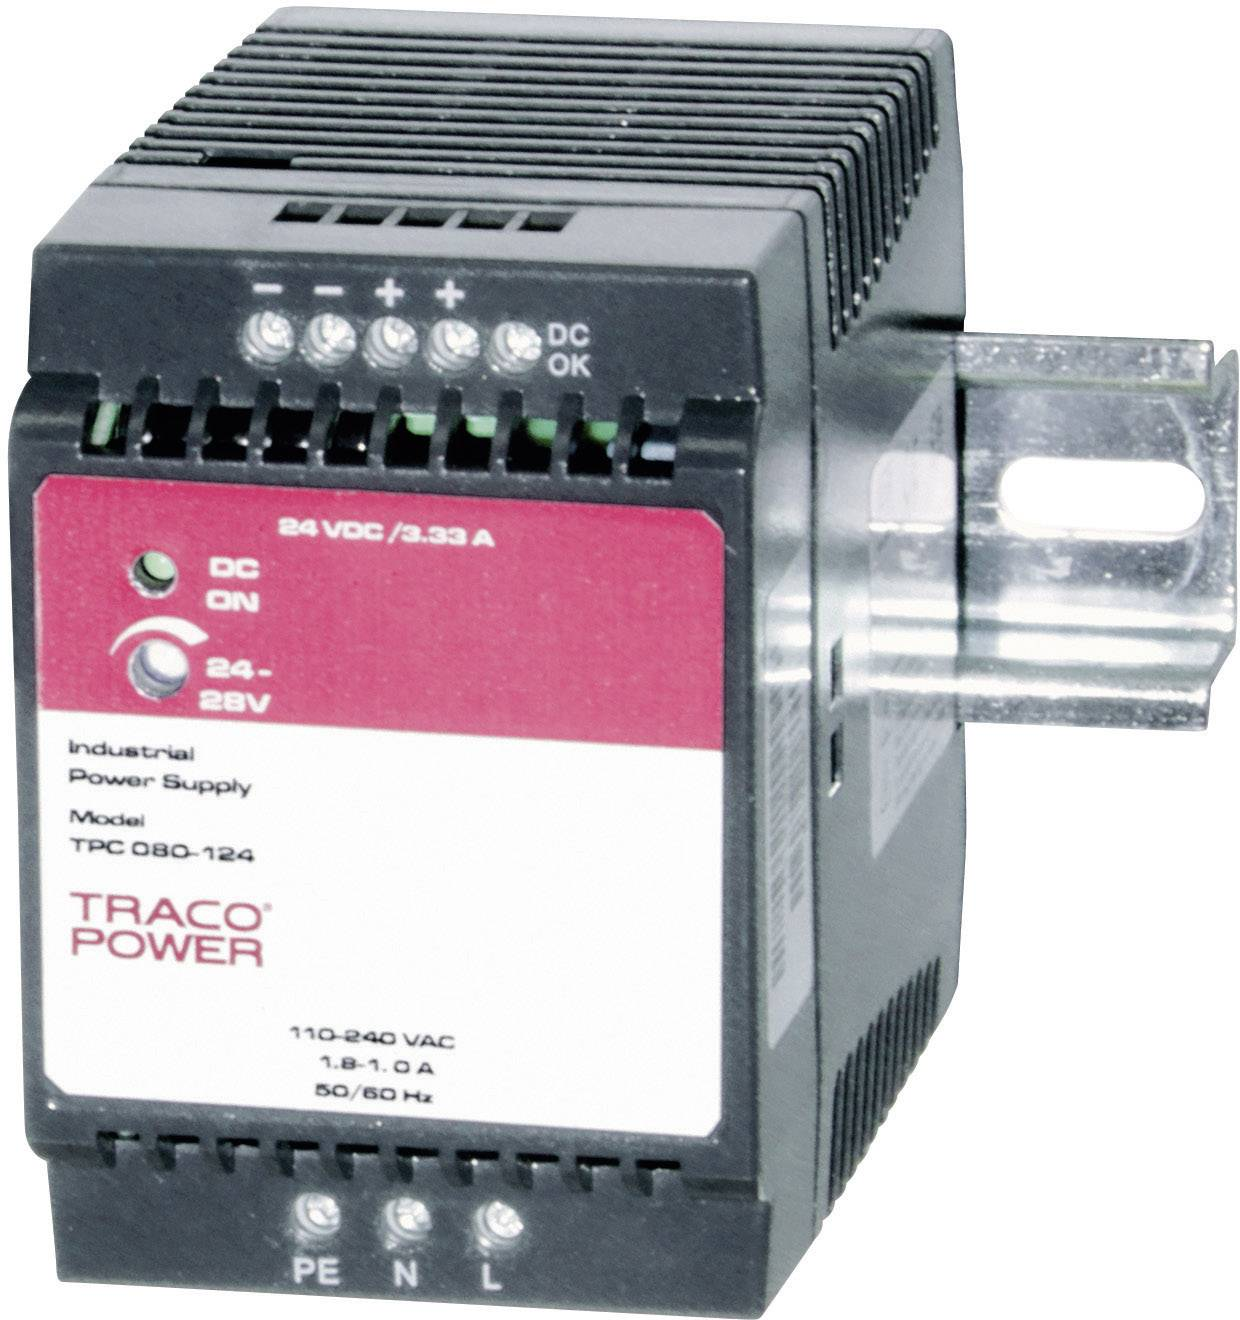 Zdroj na DIN lištu TracoPower TPC 080-148, 48 - 56 V/DC, 1,7 A